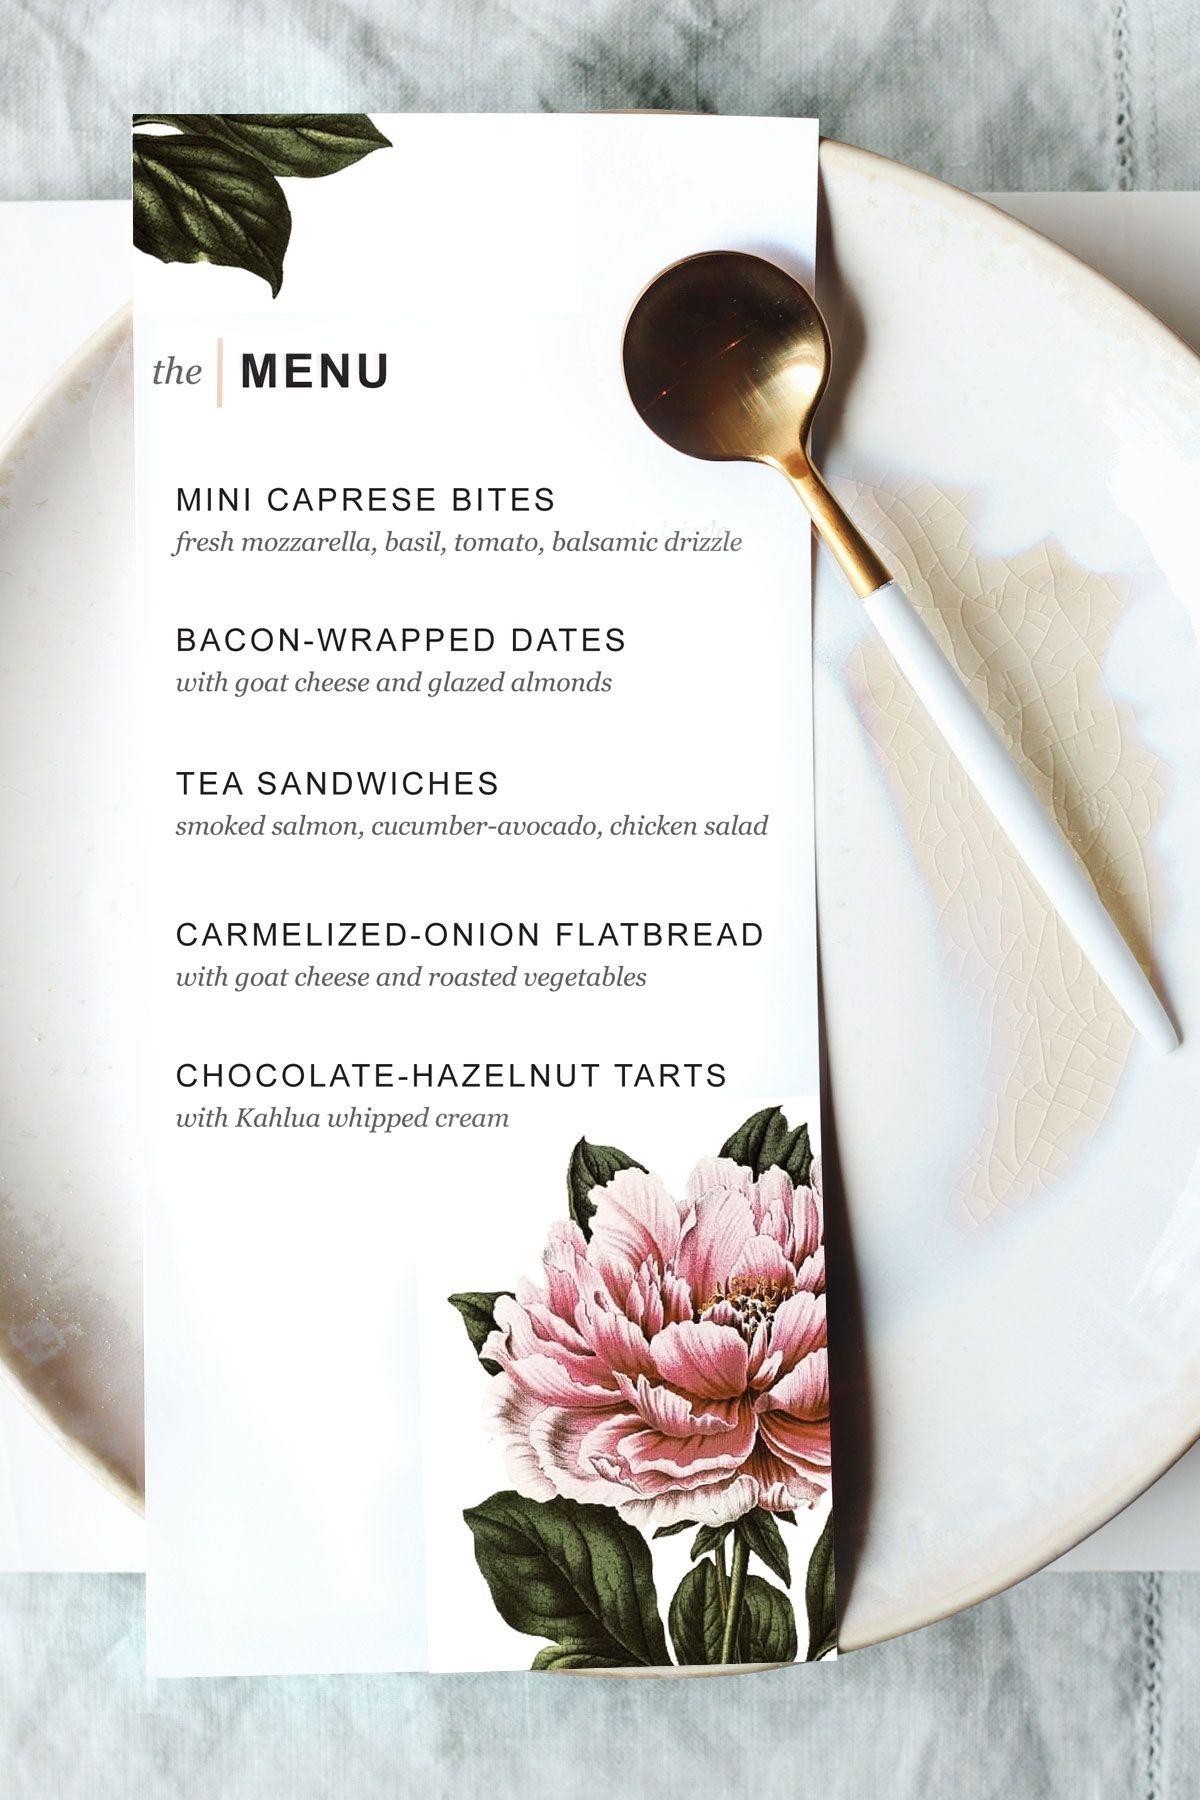 Printable Dinner Party Menu Template   Party Planning   Wedding Menu - Free Printable Restaurant Menu Templates